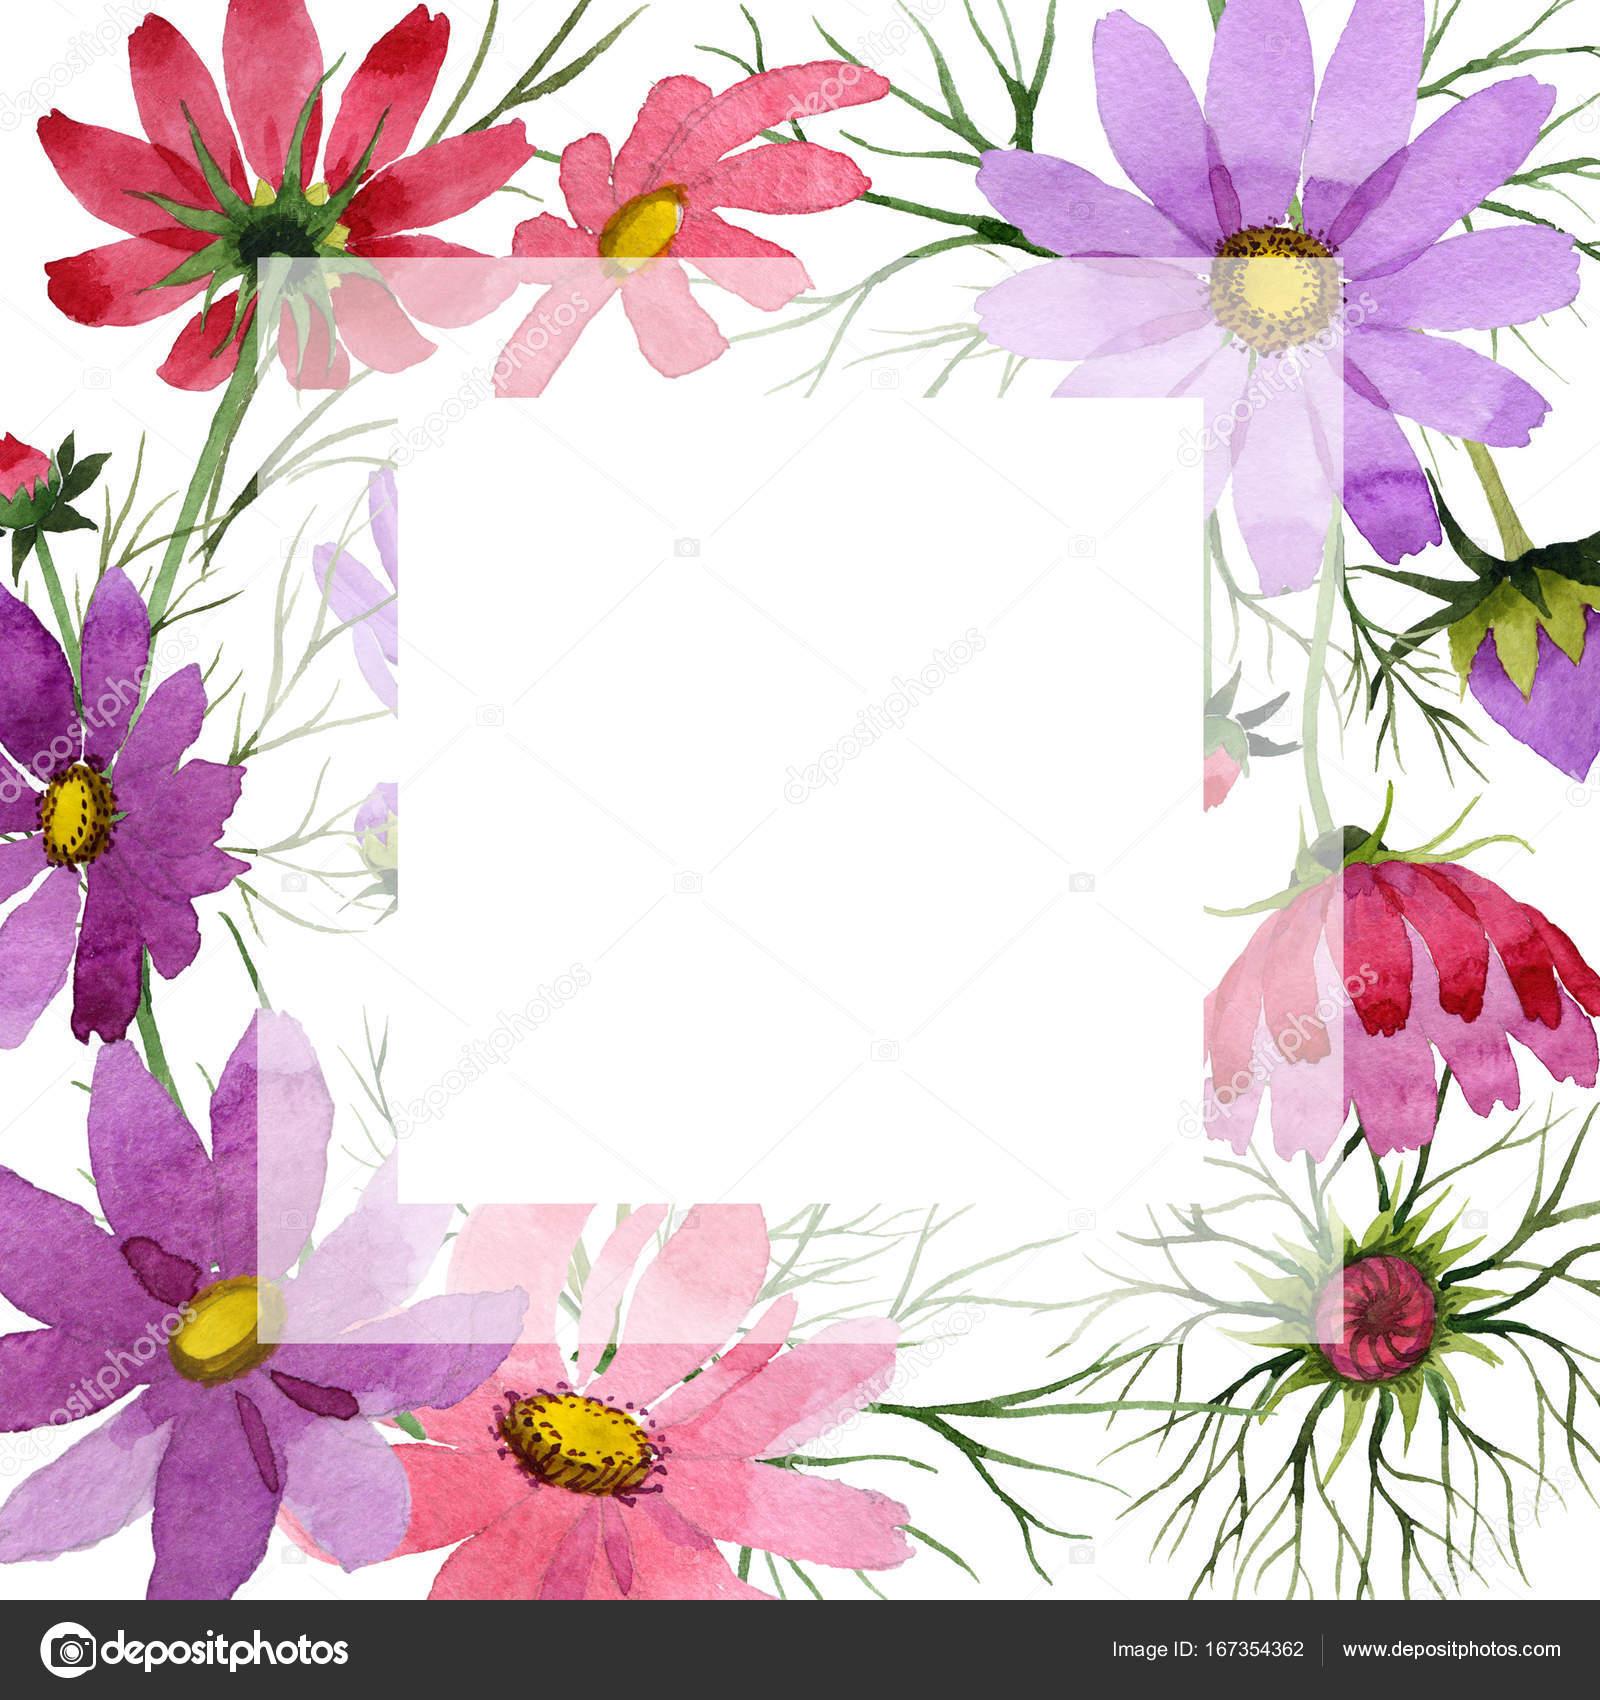 Marco de flores kosmeya de flores silvestres en un estilo acuarela ...